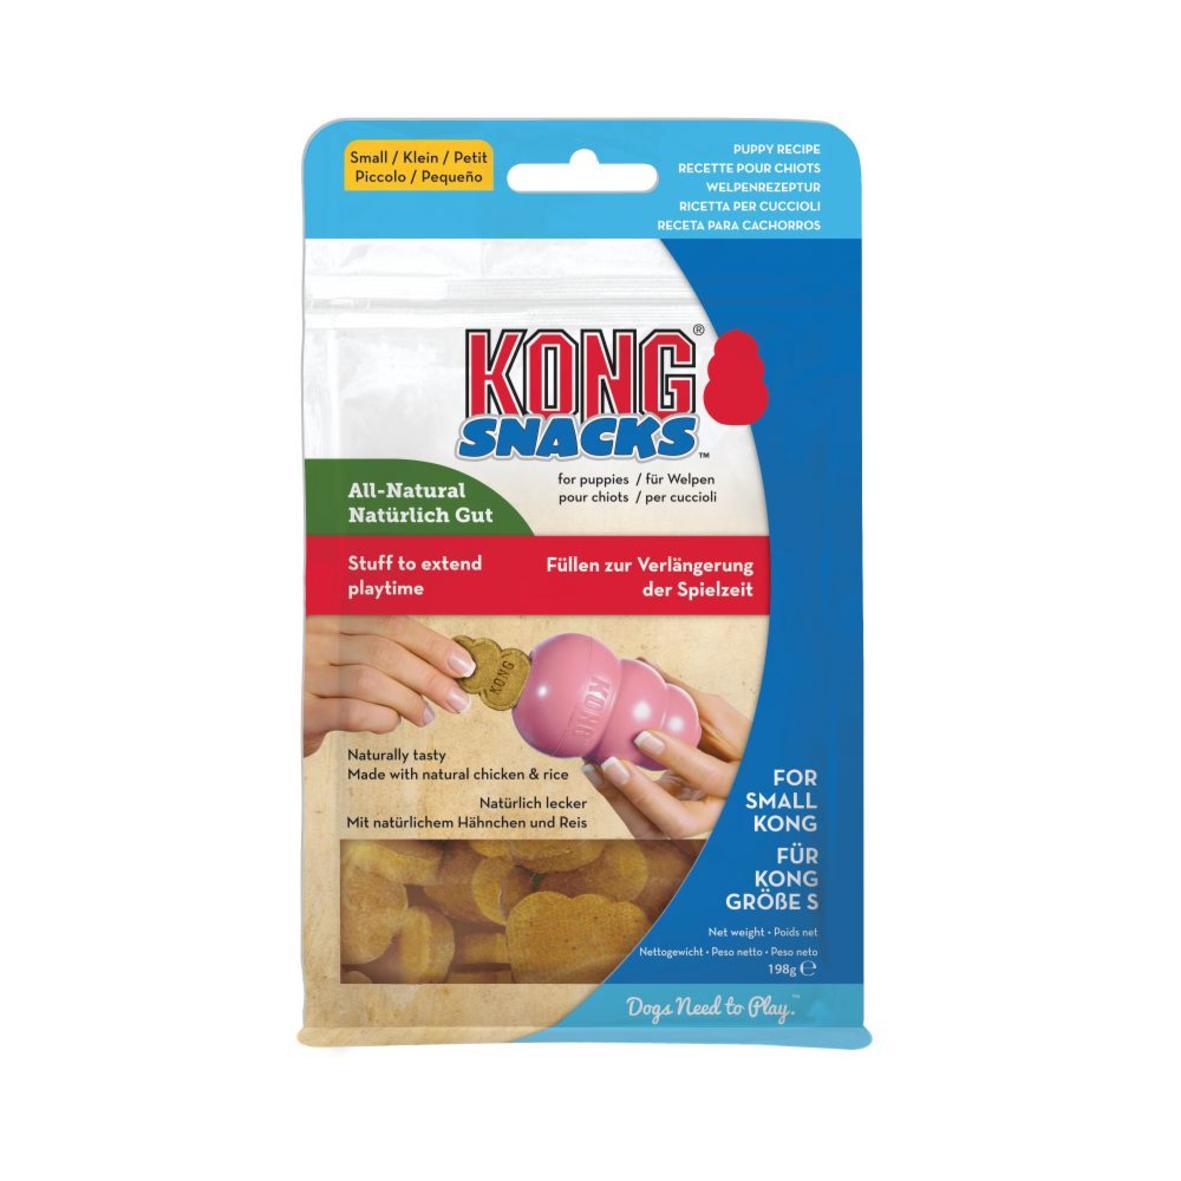 KONG Snacks Puppy Recipe Chicken Liver